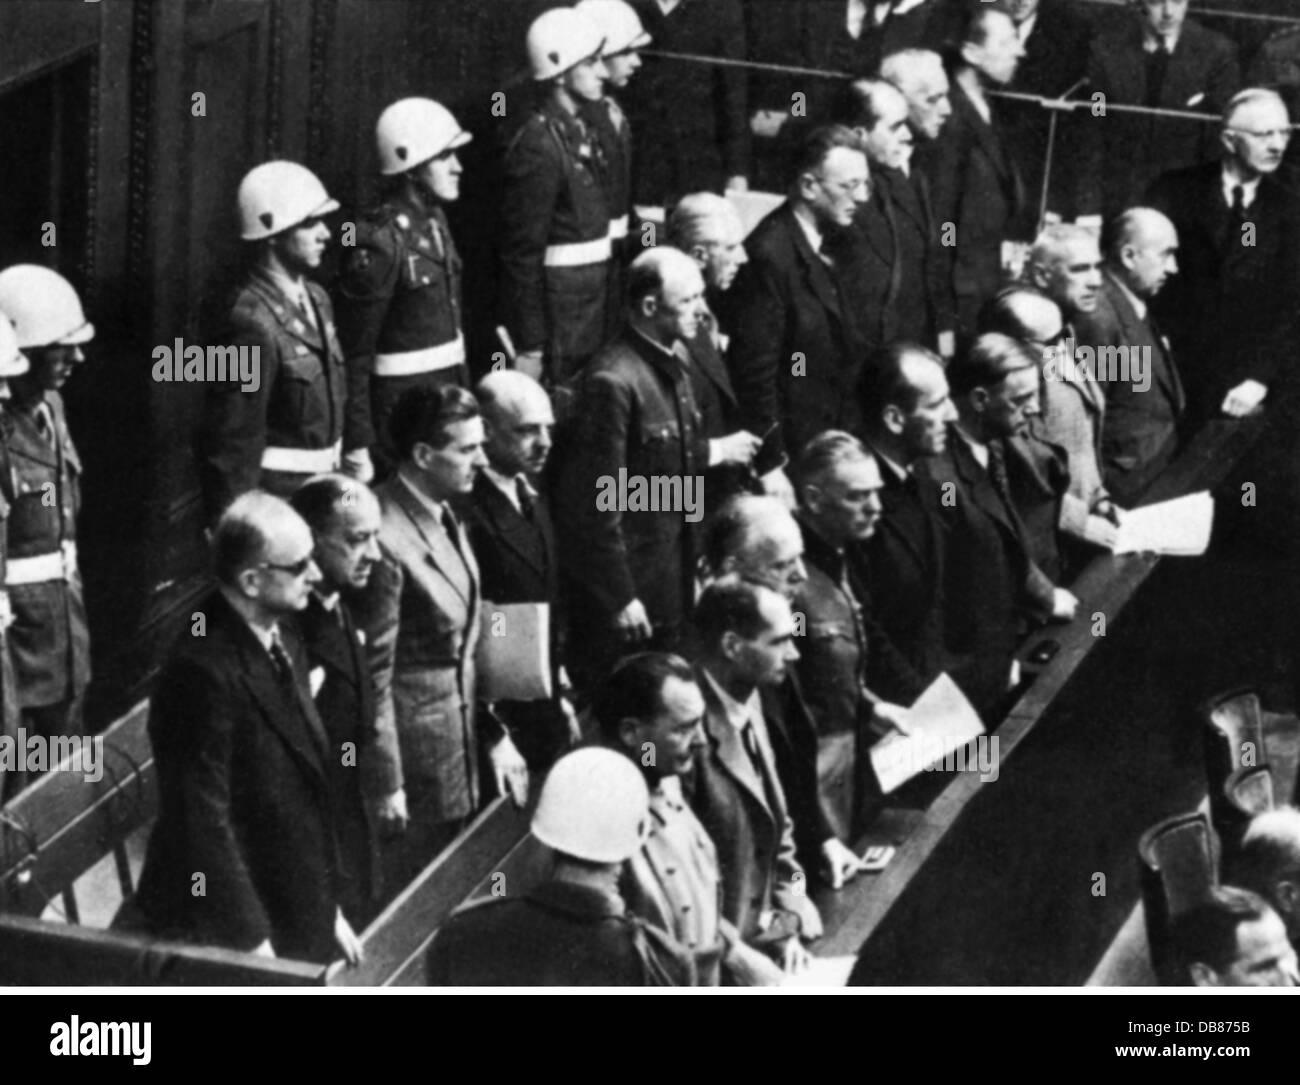 justice, lawsuits, Nuremberg Trials, trial against the major war criminals, dock, Nuremberg, 1945 / 1946, from: Stock Photo